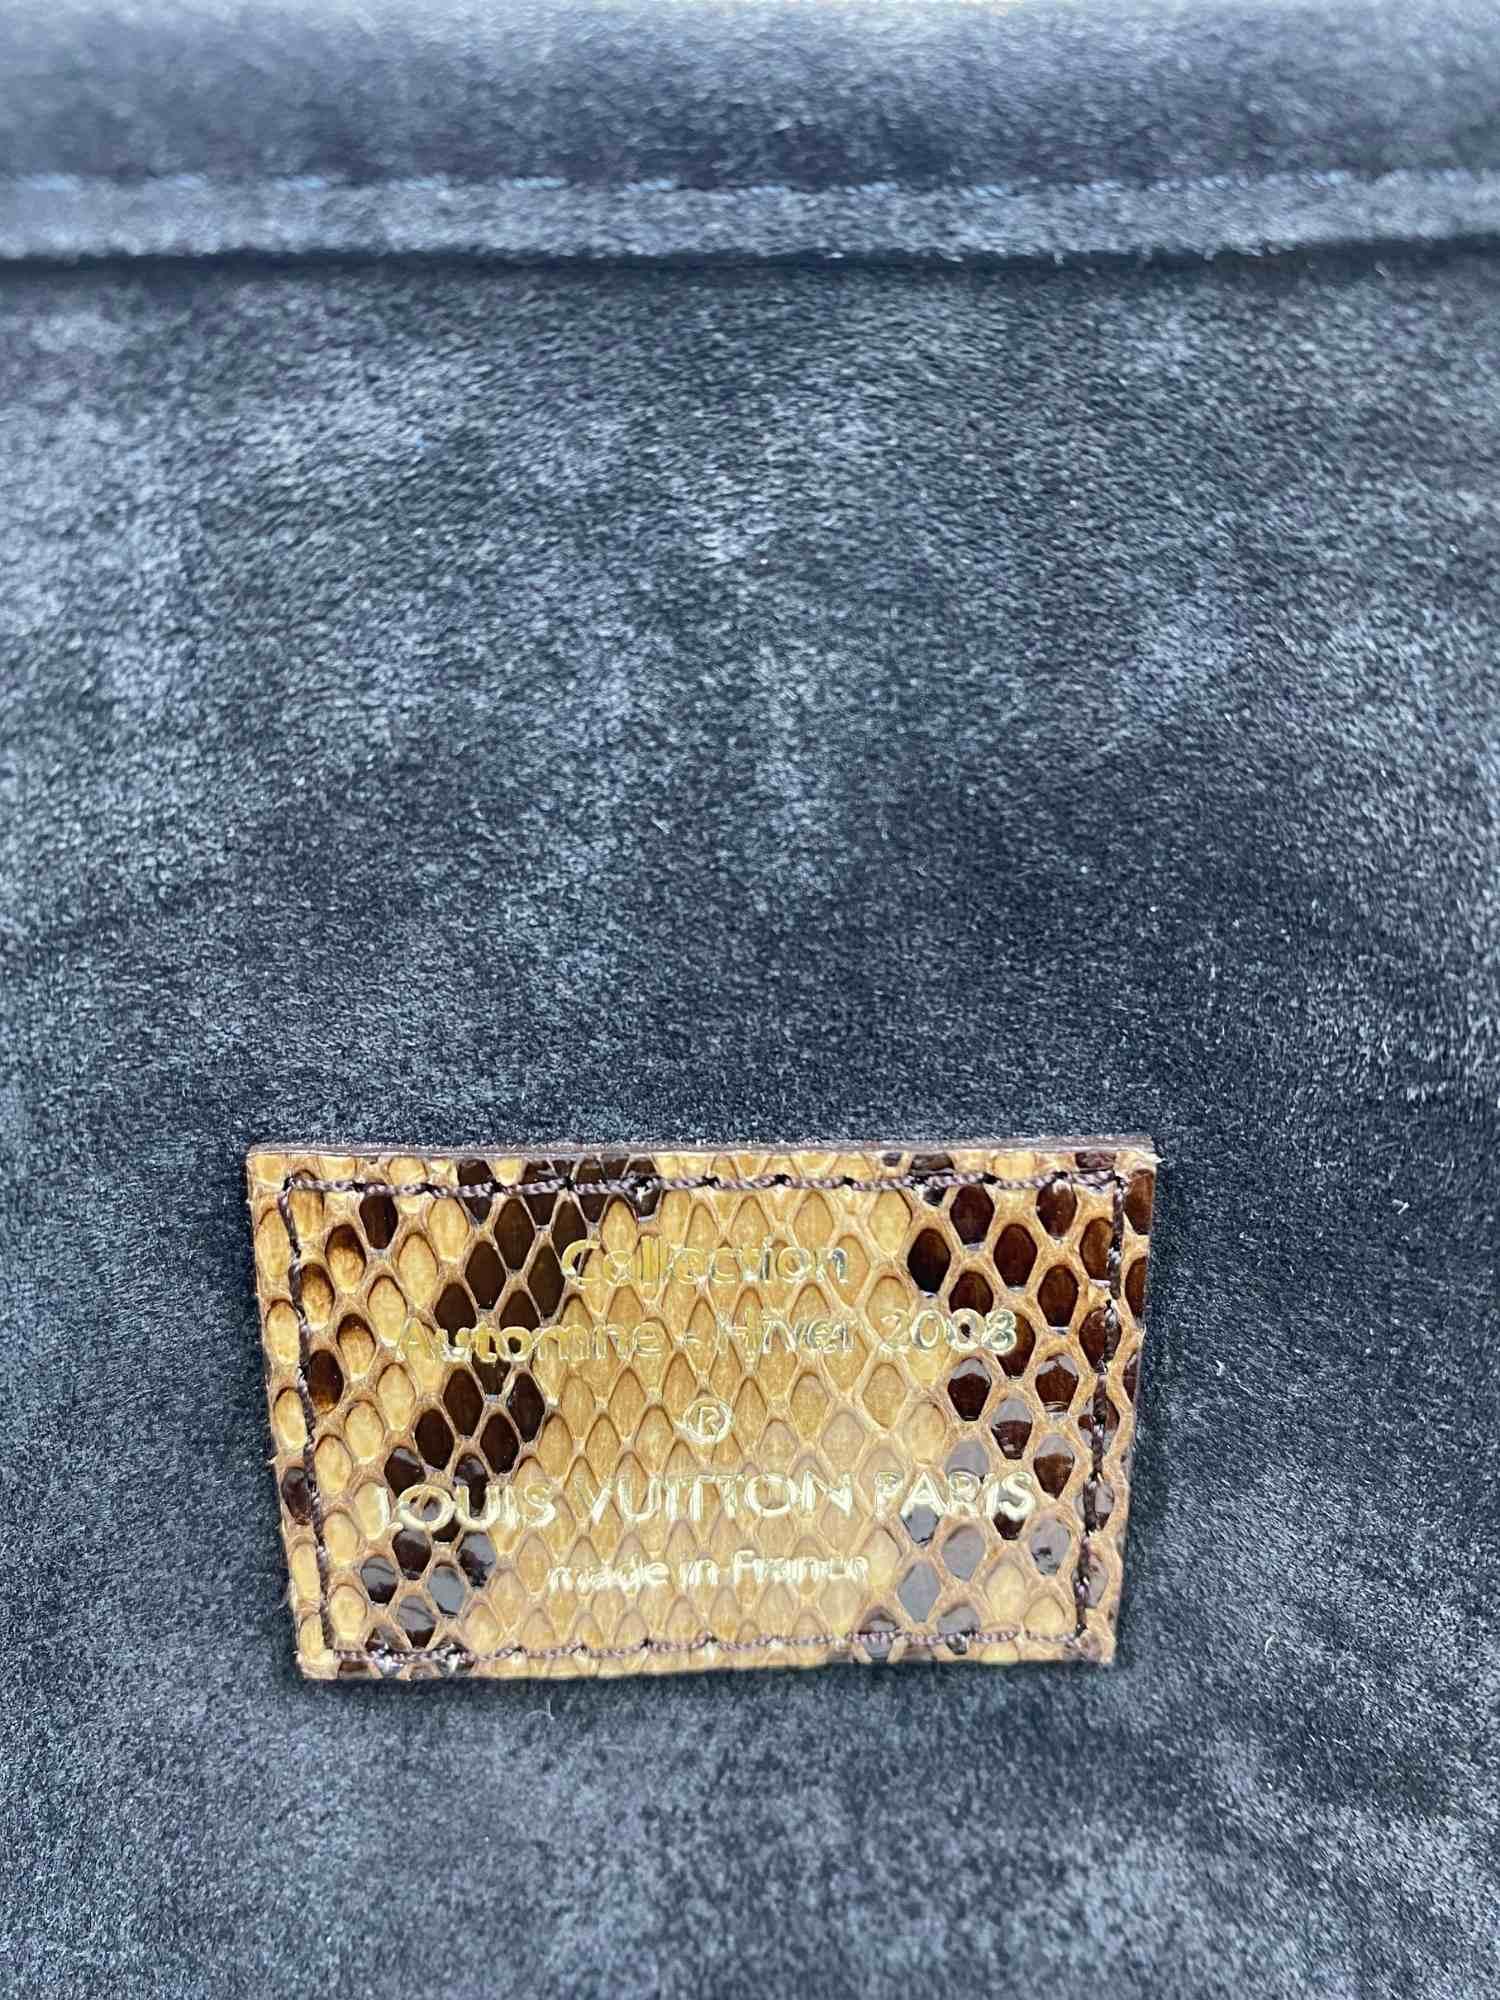 Bolsa Louis Vuitton Kohl Monogram Embossed Suede Whisper MM